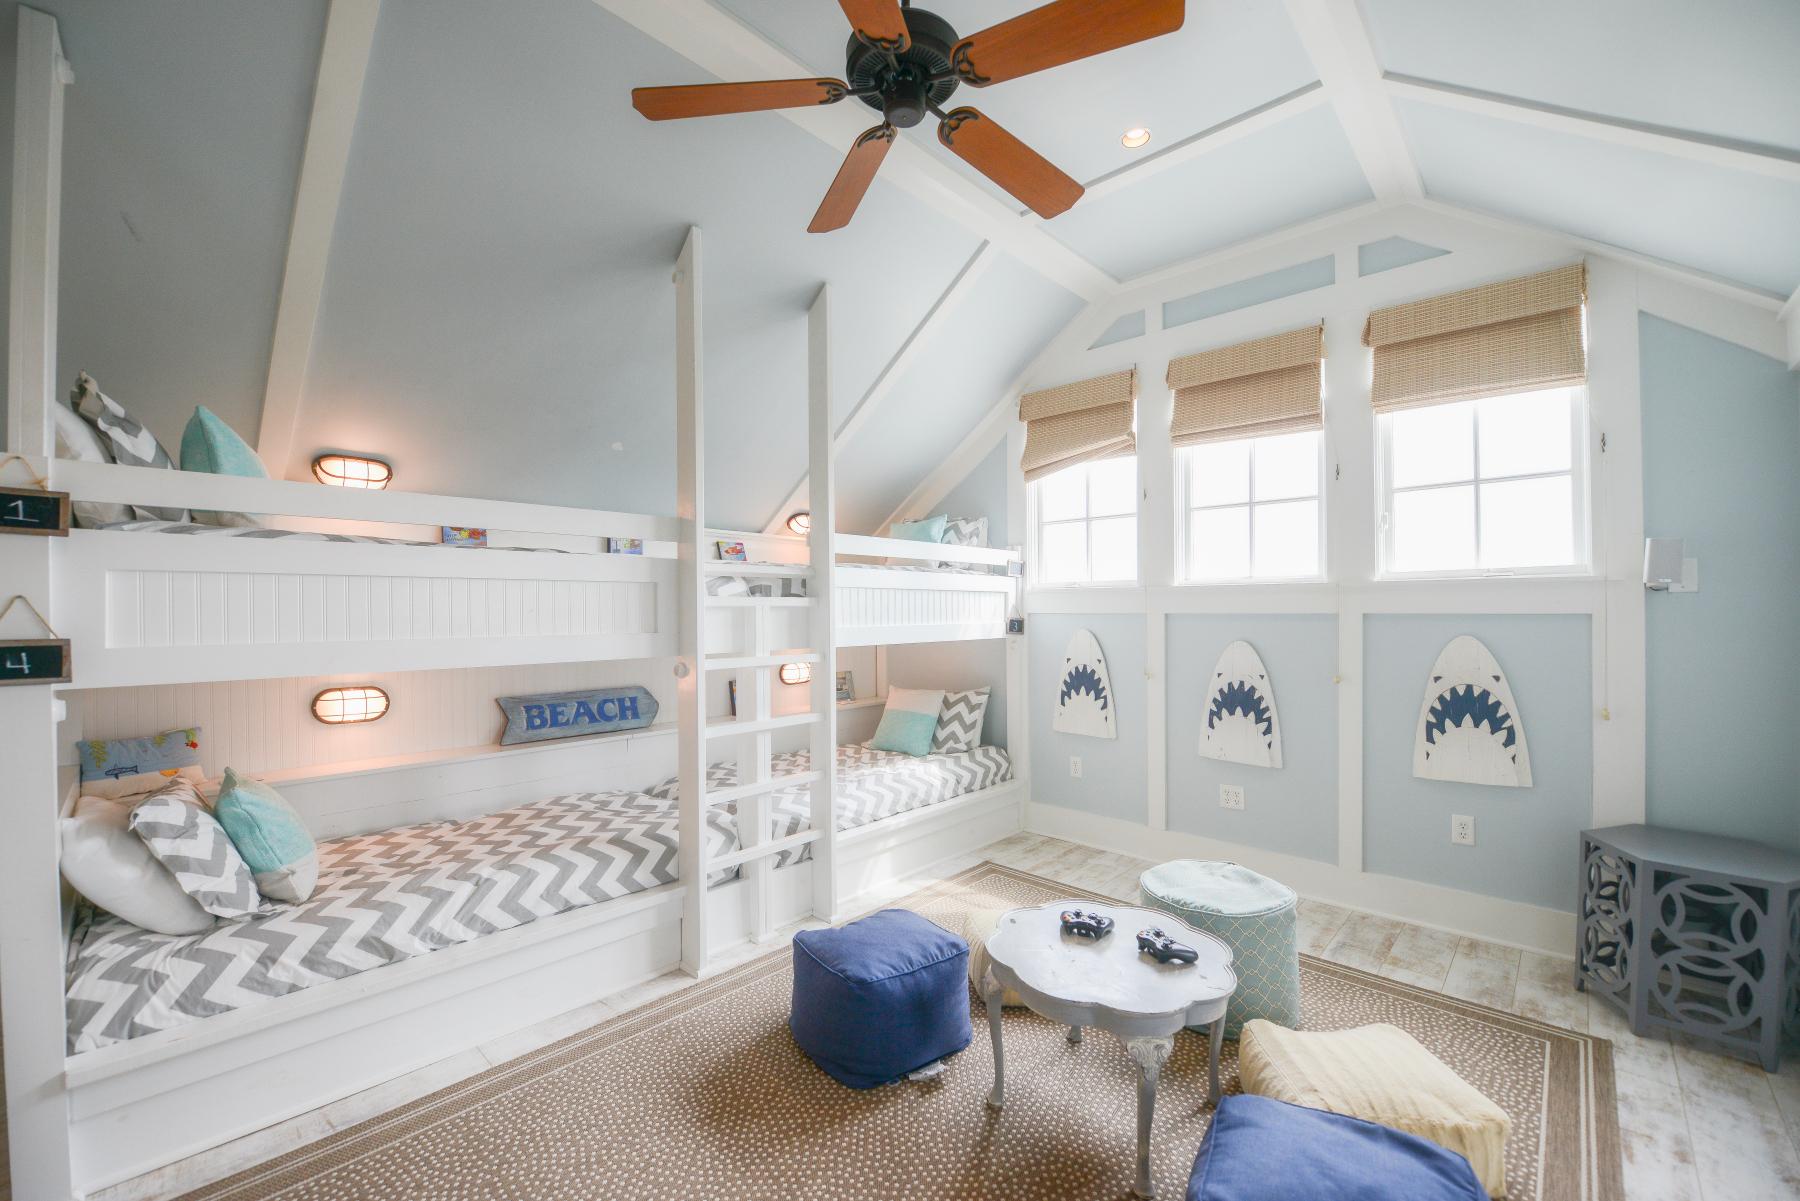 Watercolor florida beach house bunkbed room.jpeg